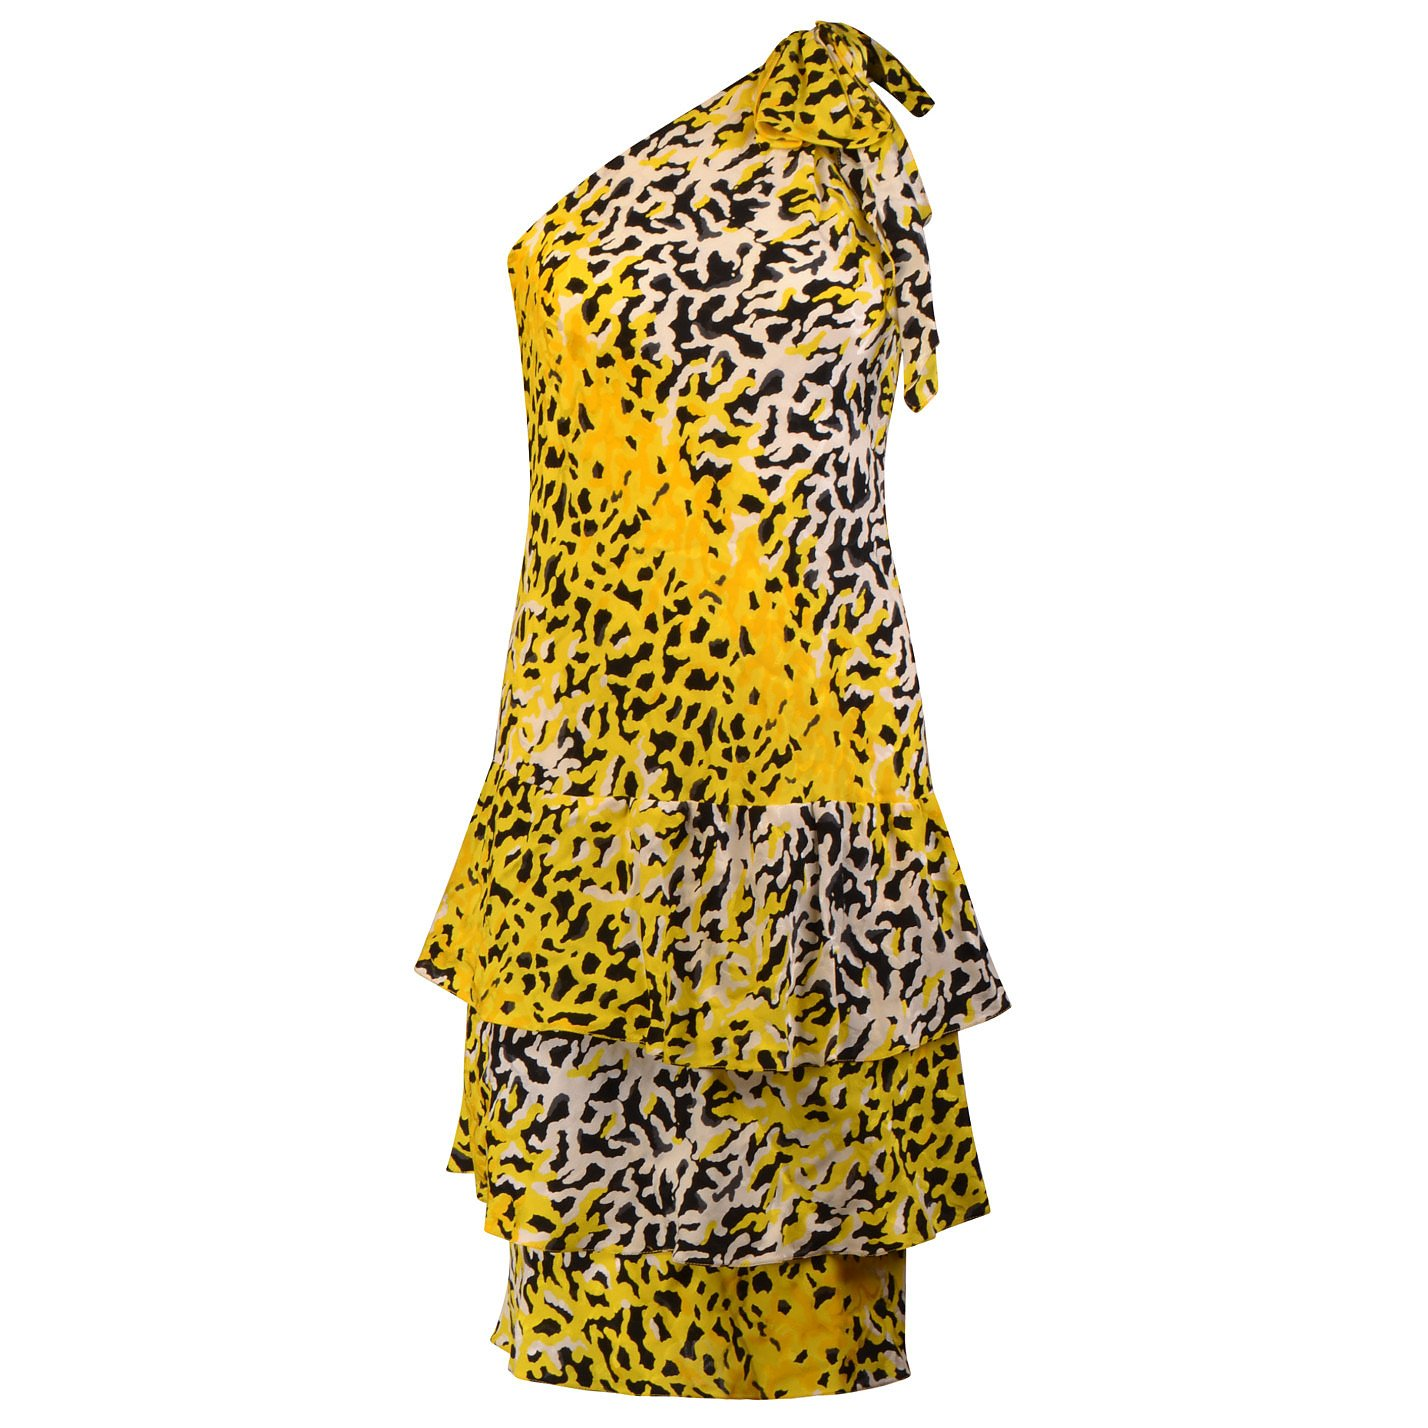 Pallant One-Shoulder Animal Print Dress